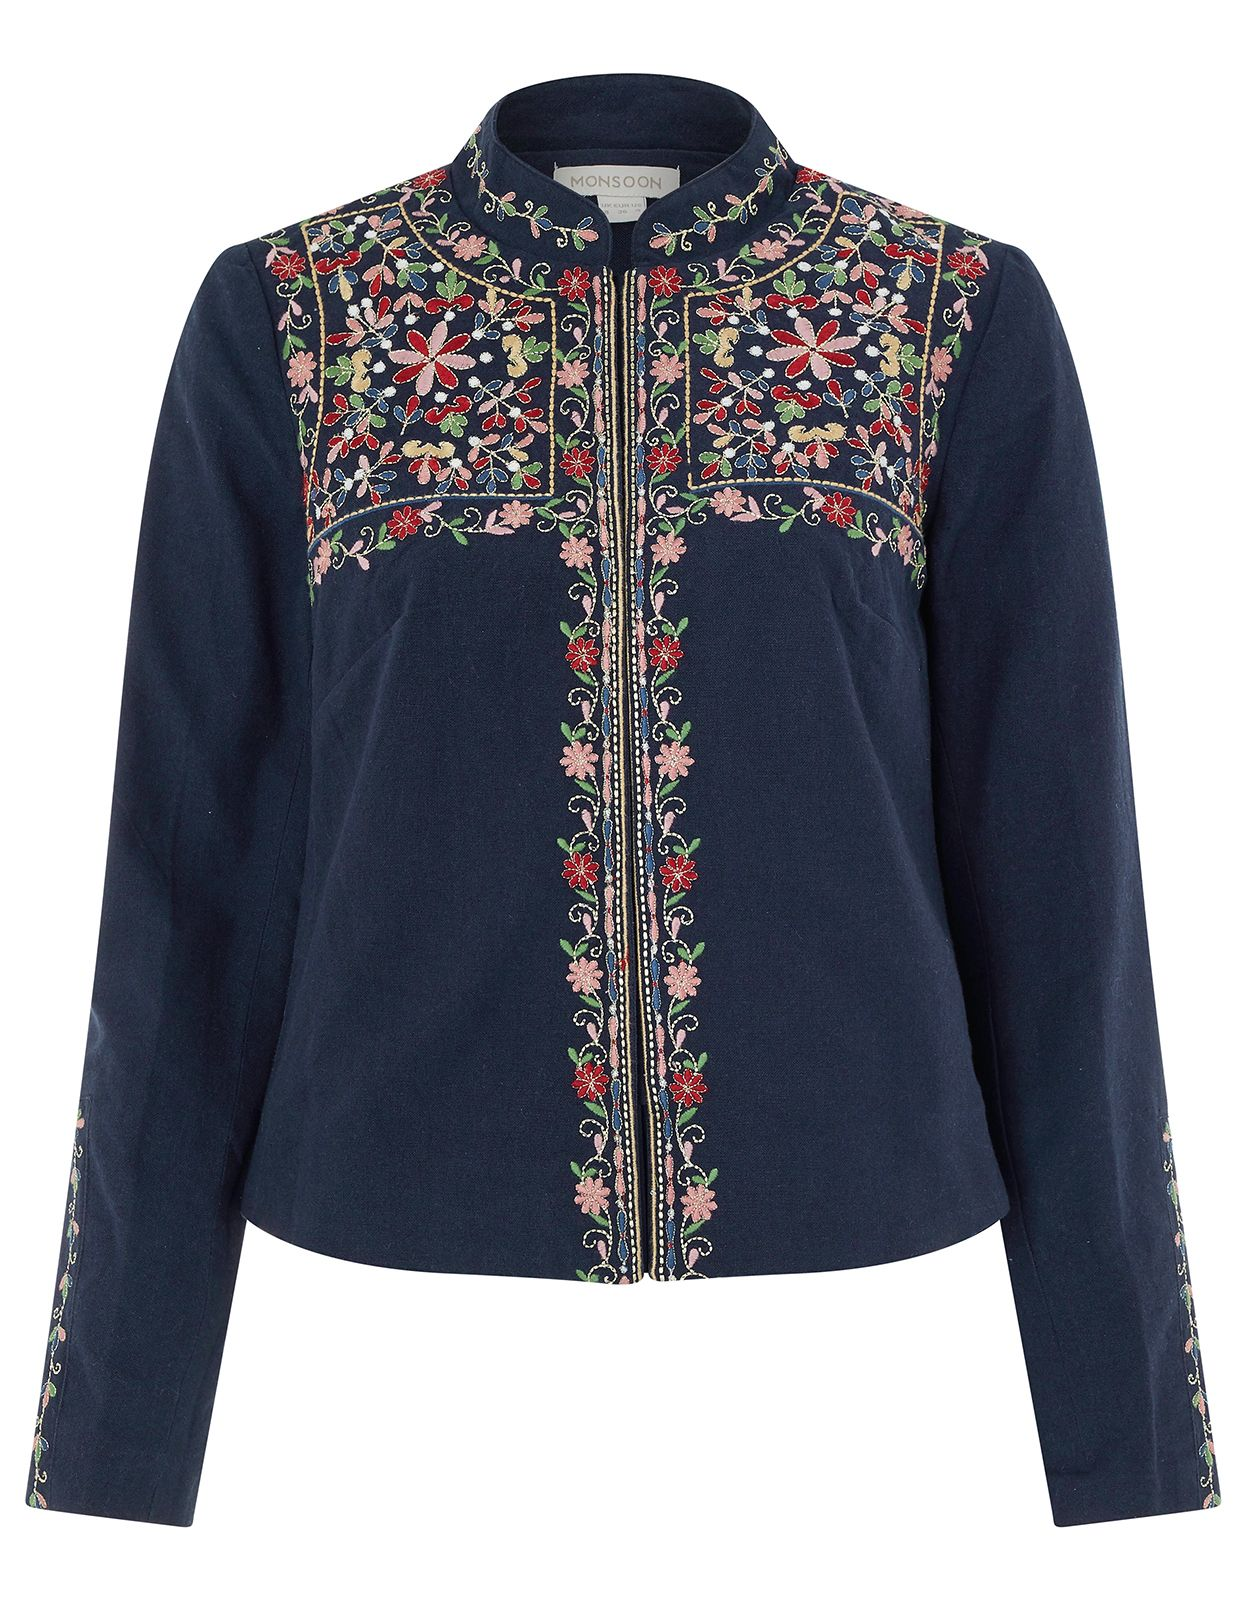 200d78736613 Monsoon | Elisha Embroidered Jacket | Navy | 8 | 4428806108 ...